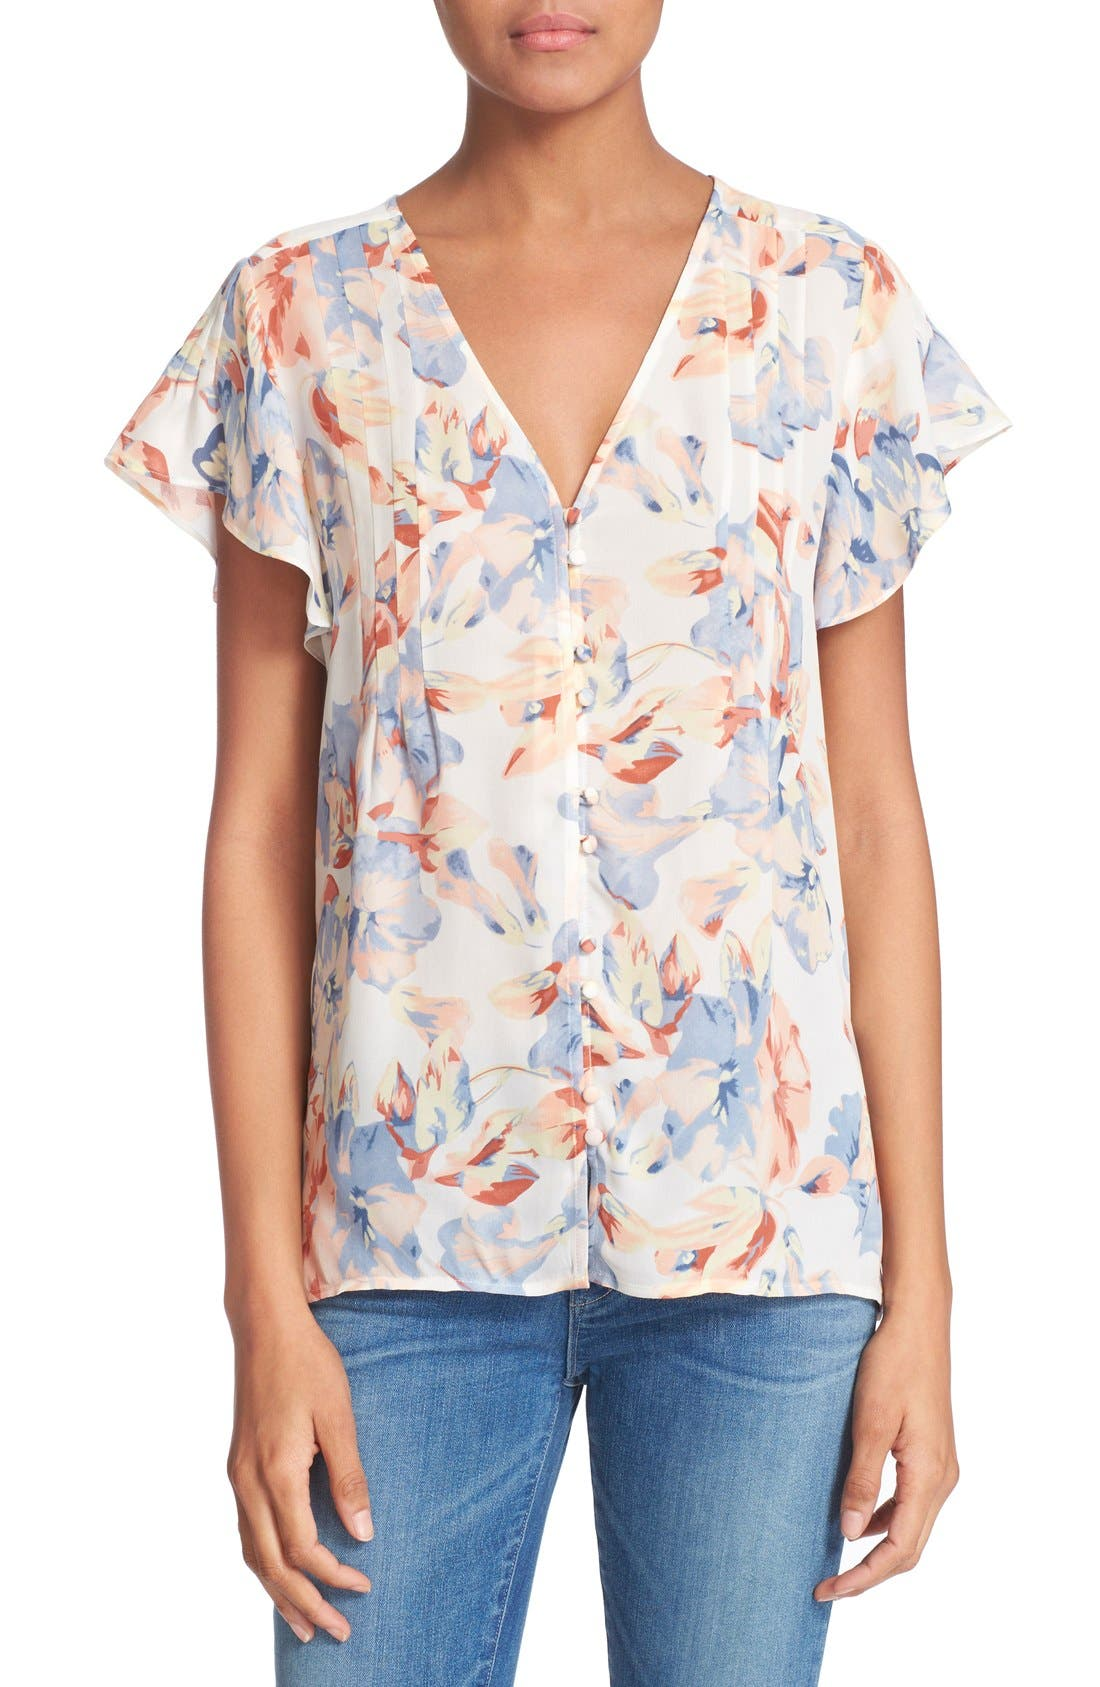 JOIE 'Annite' Floral Print Silk Top, Main, color, 901